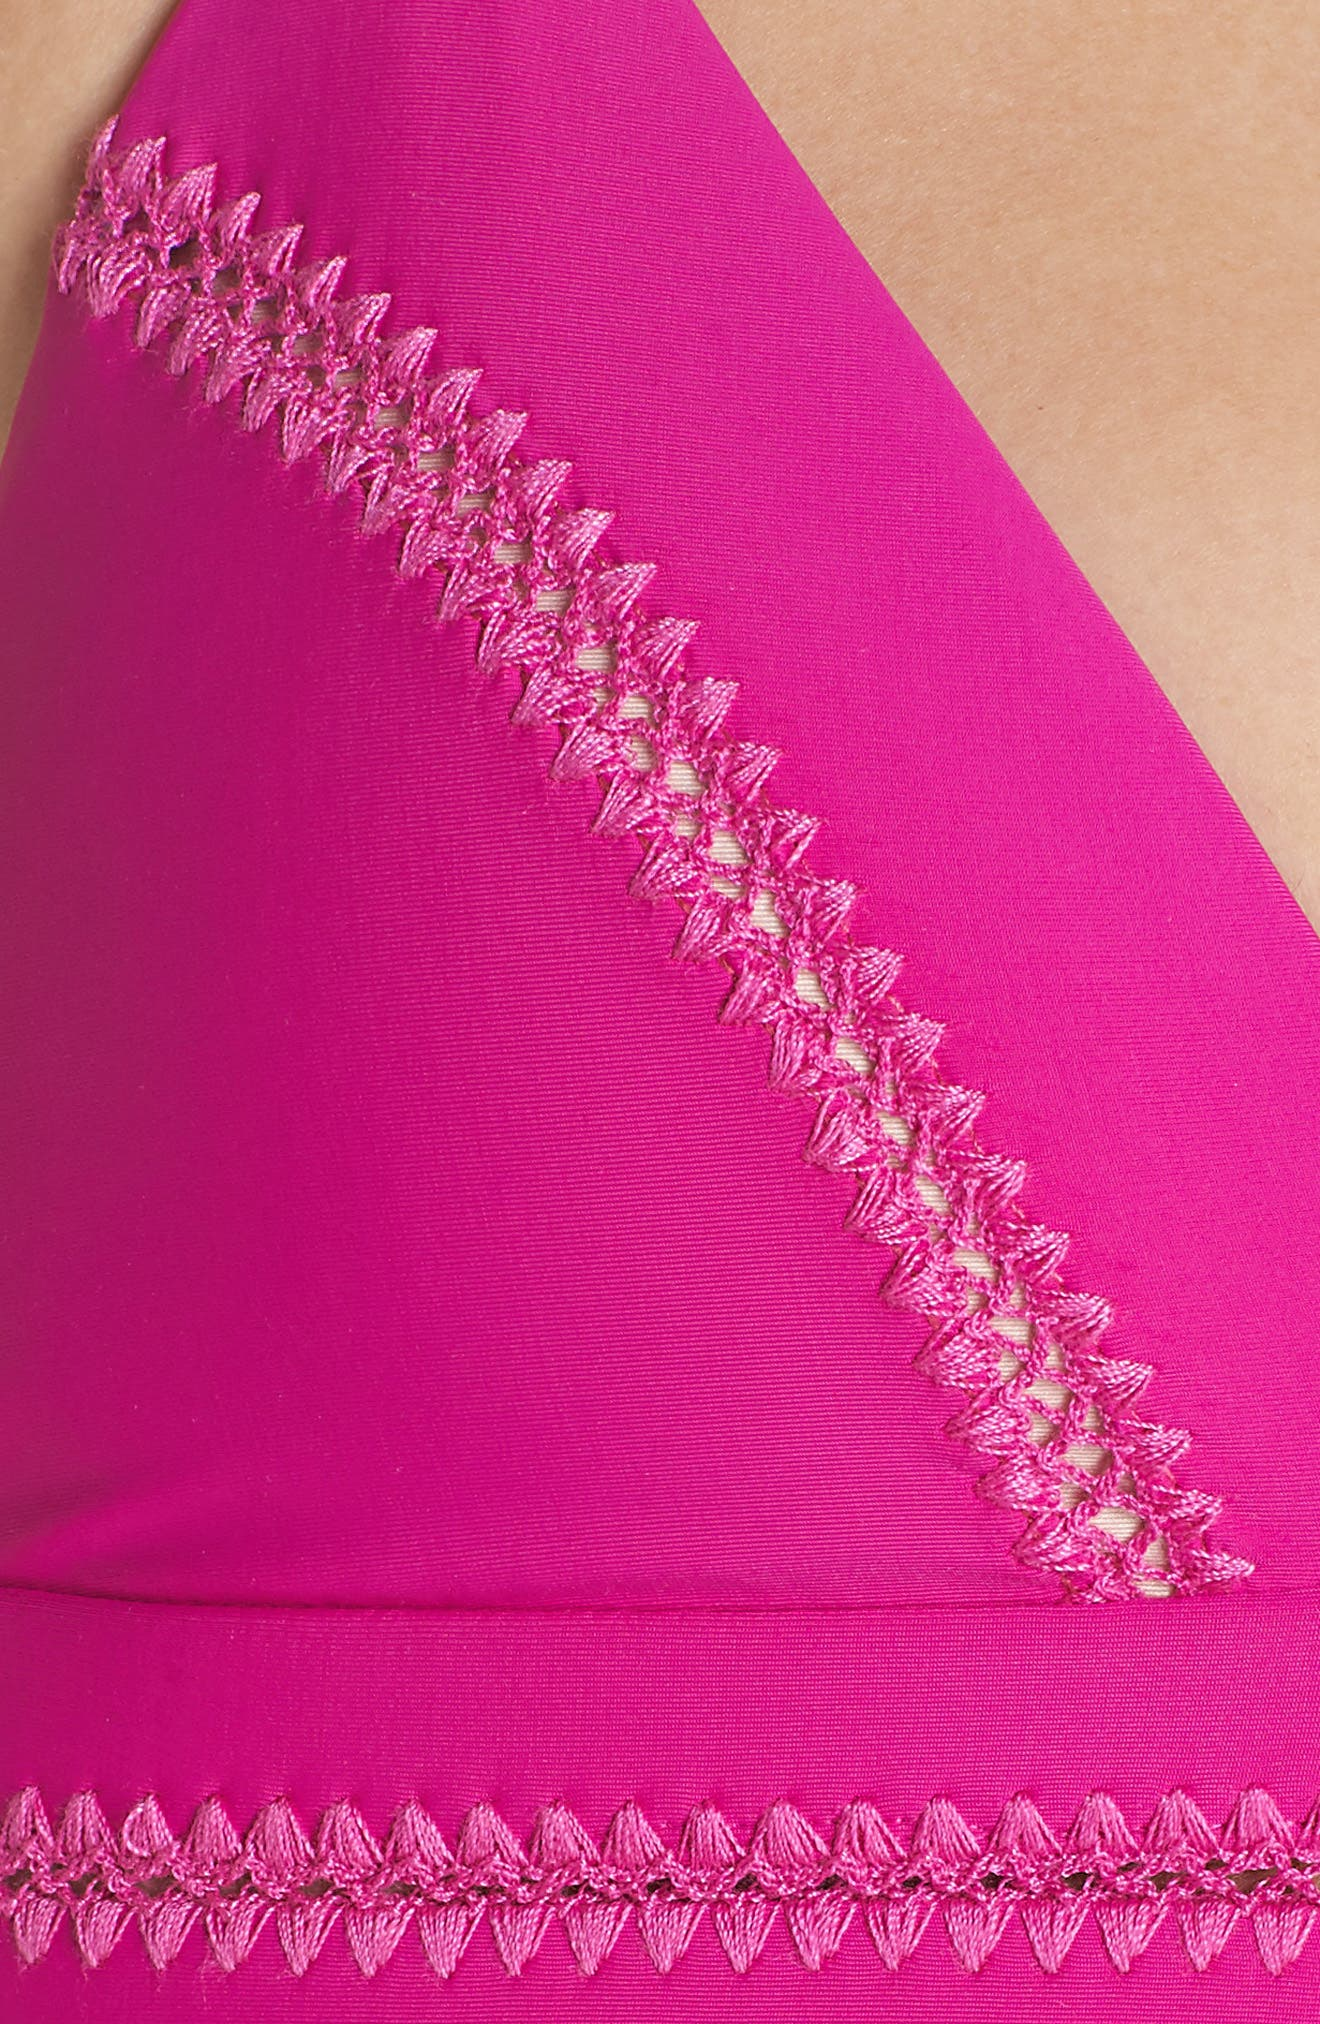 Stitched Elle Halter Bikini Top,                             Alternate thumbnail 8, color,                             Fuchsia